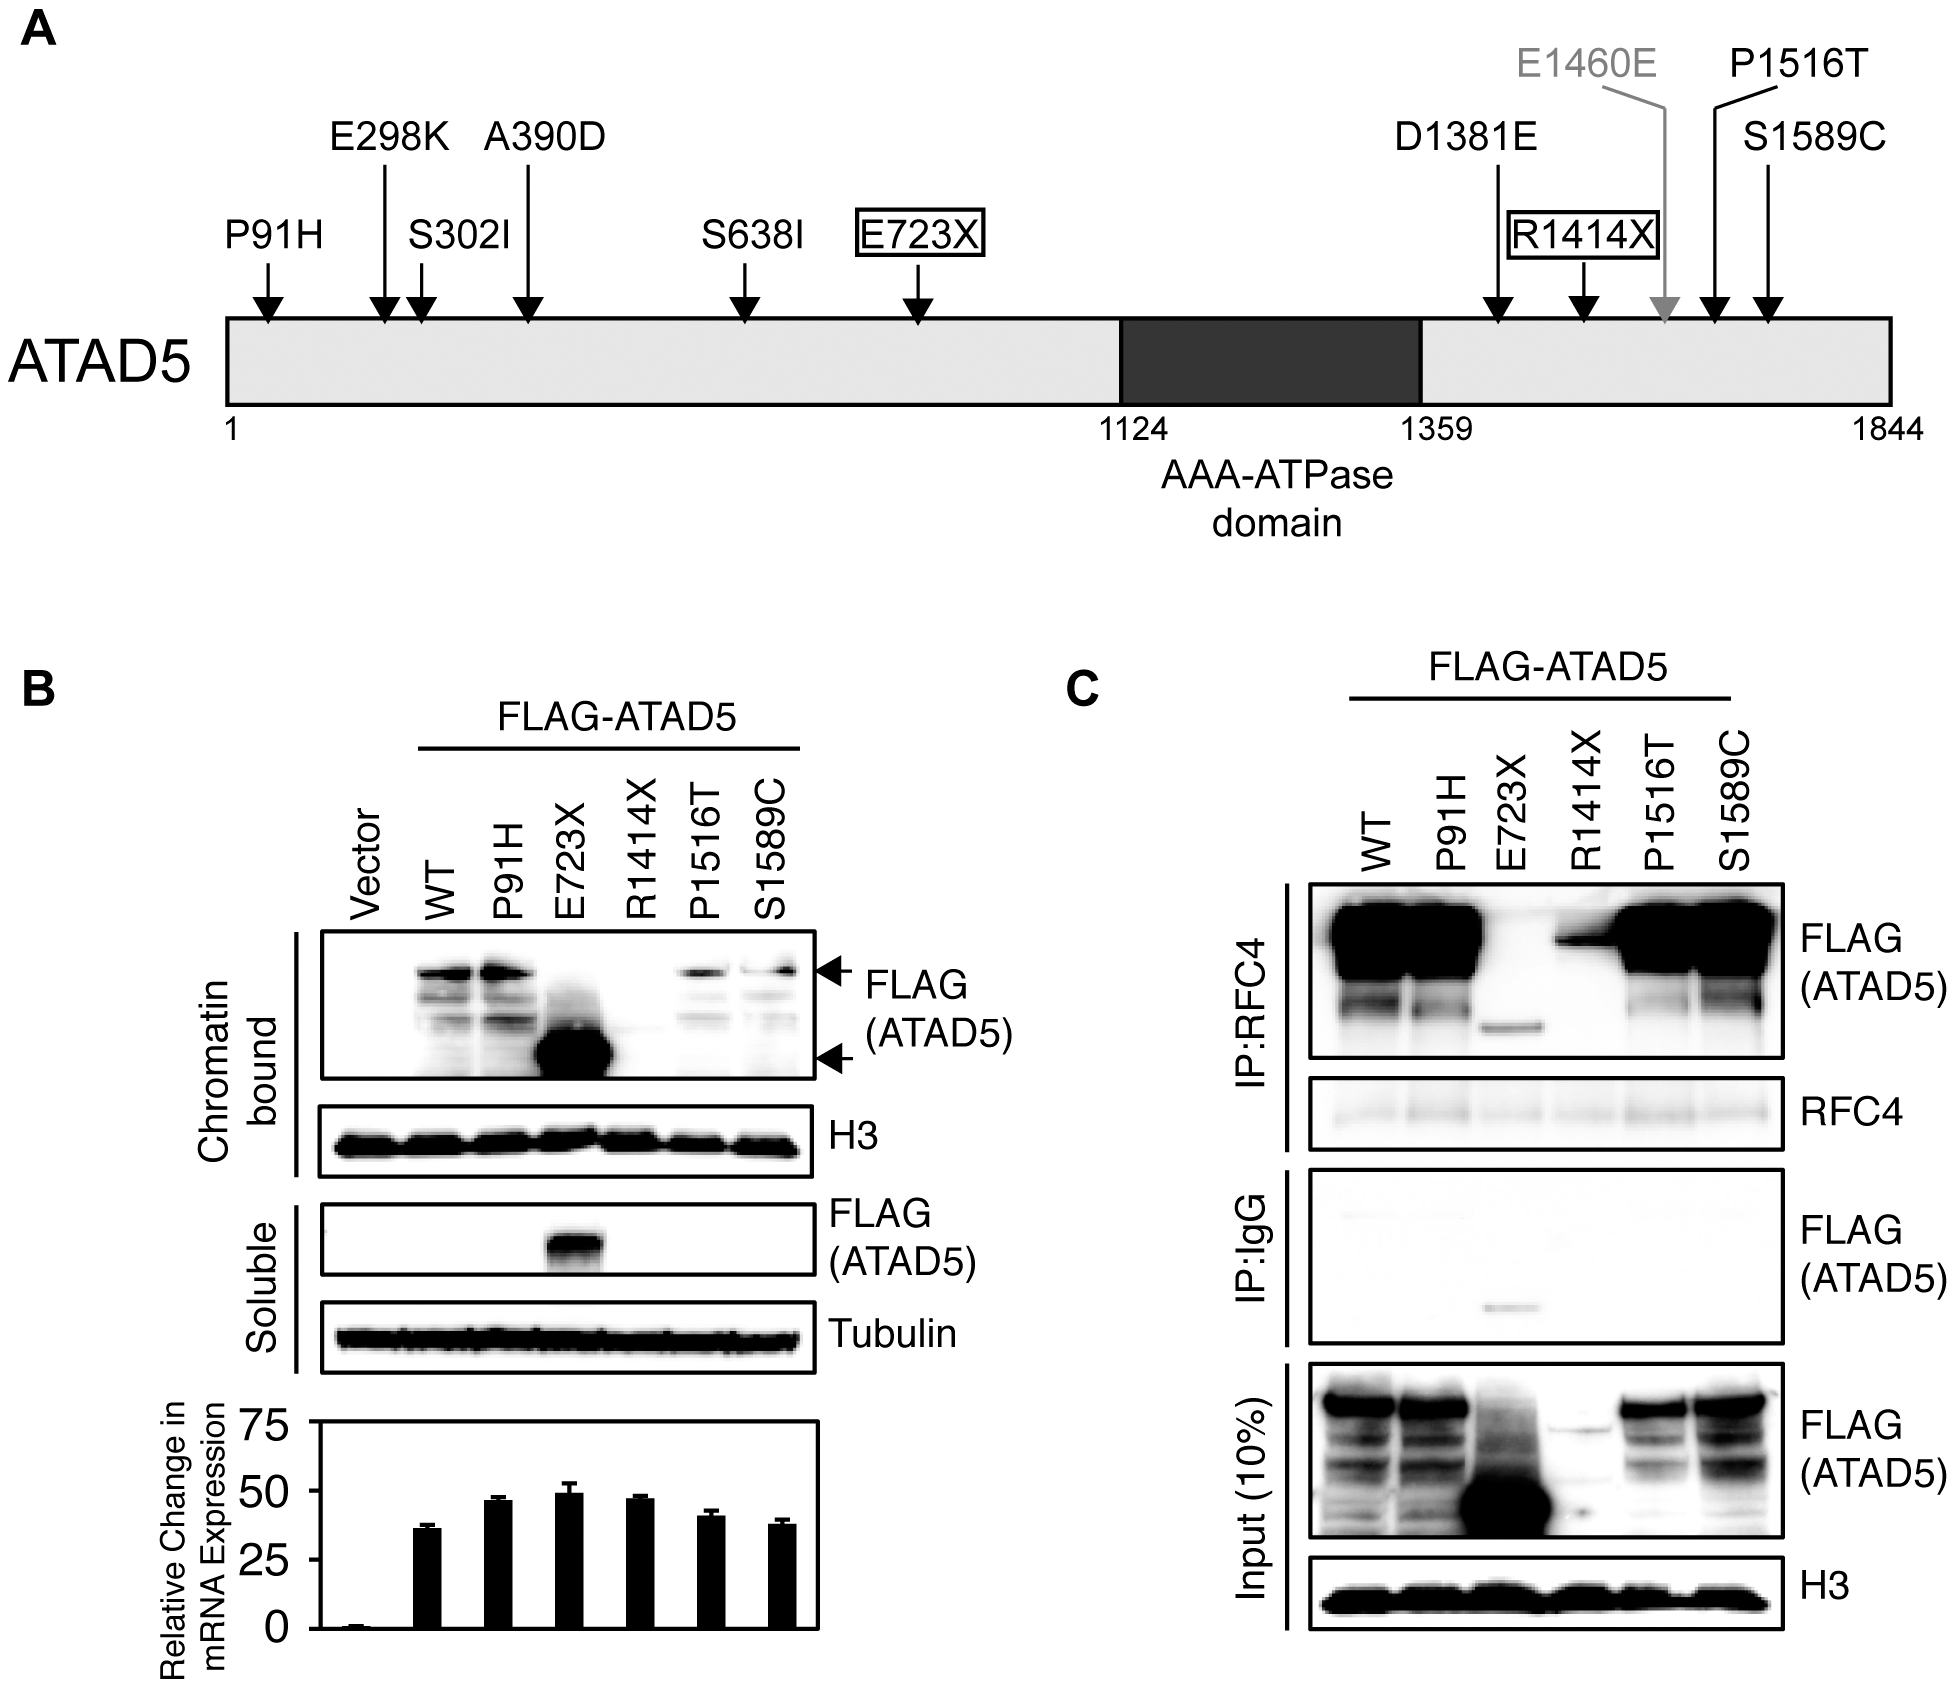 Somatic mutations of <i>ATAD5</i> in primary endometrial tumors exhibit functional defects <i>in vitro</i>.